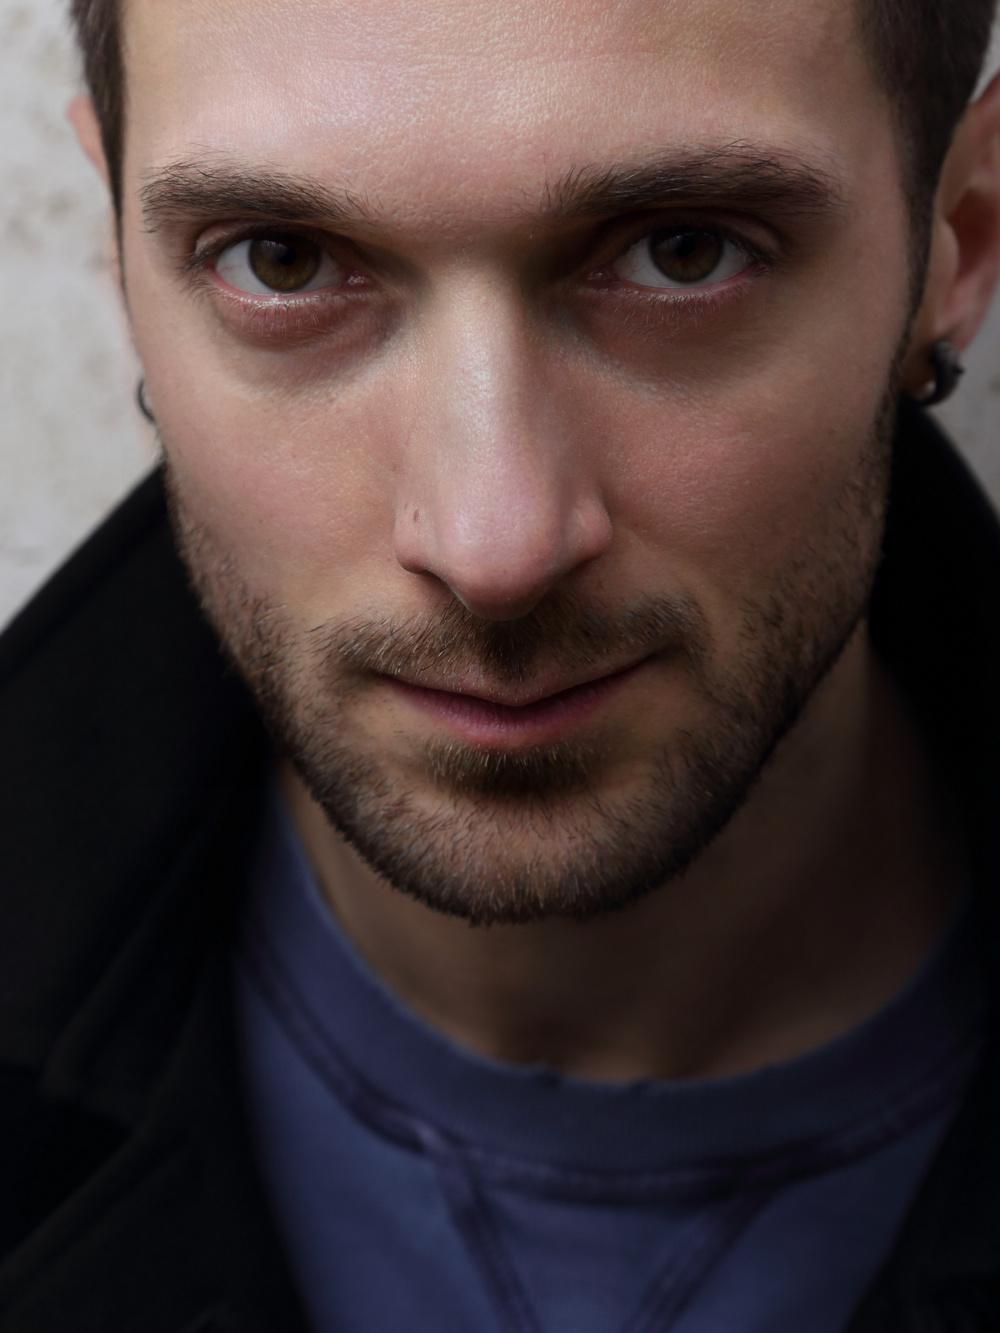 Emanuele, Feb 2015